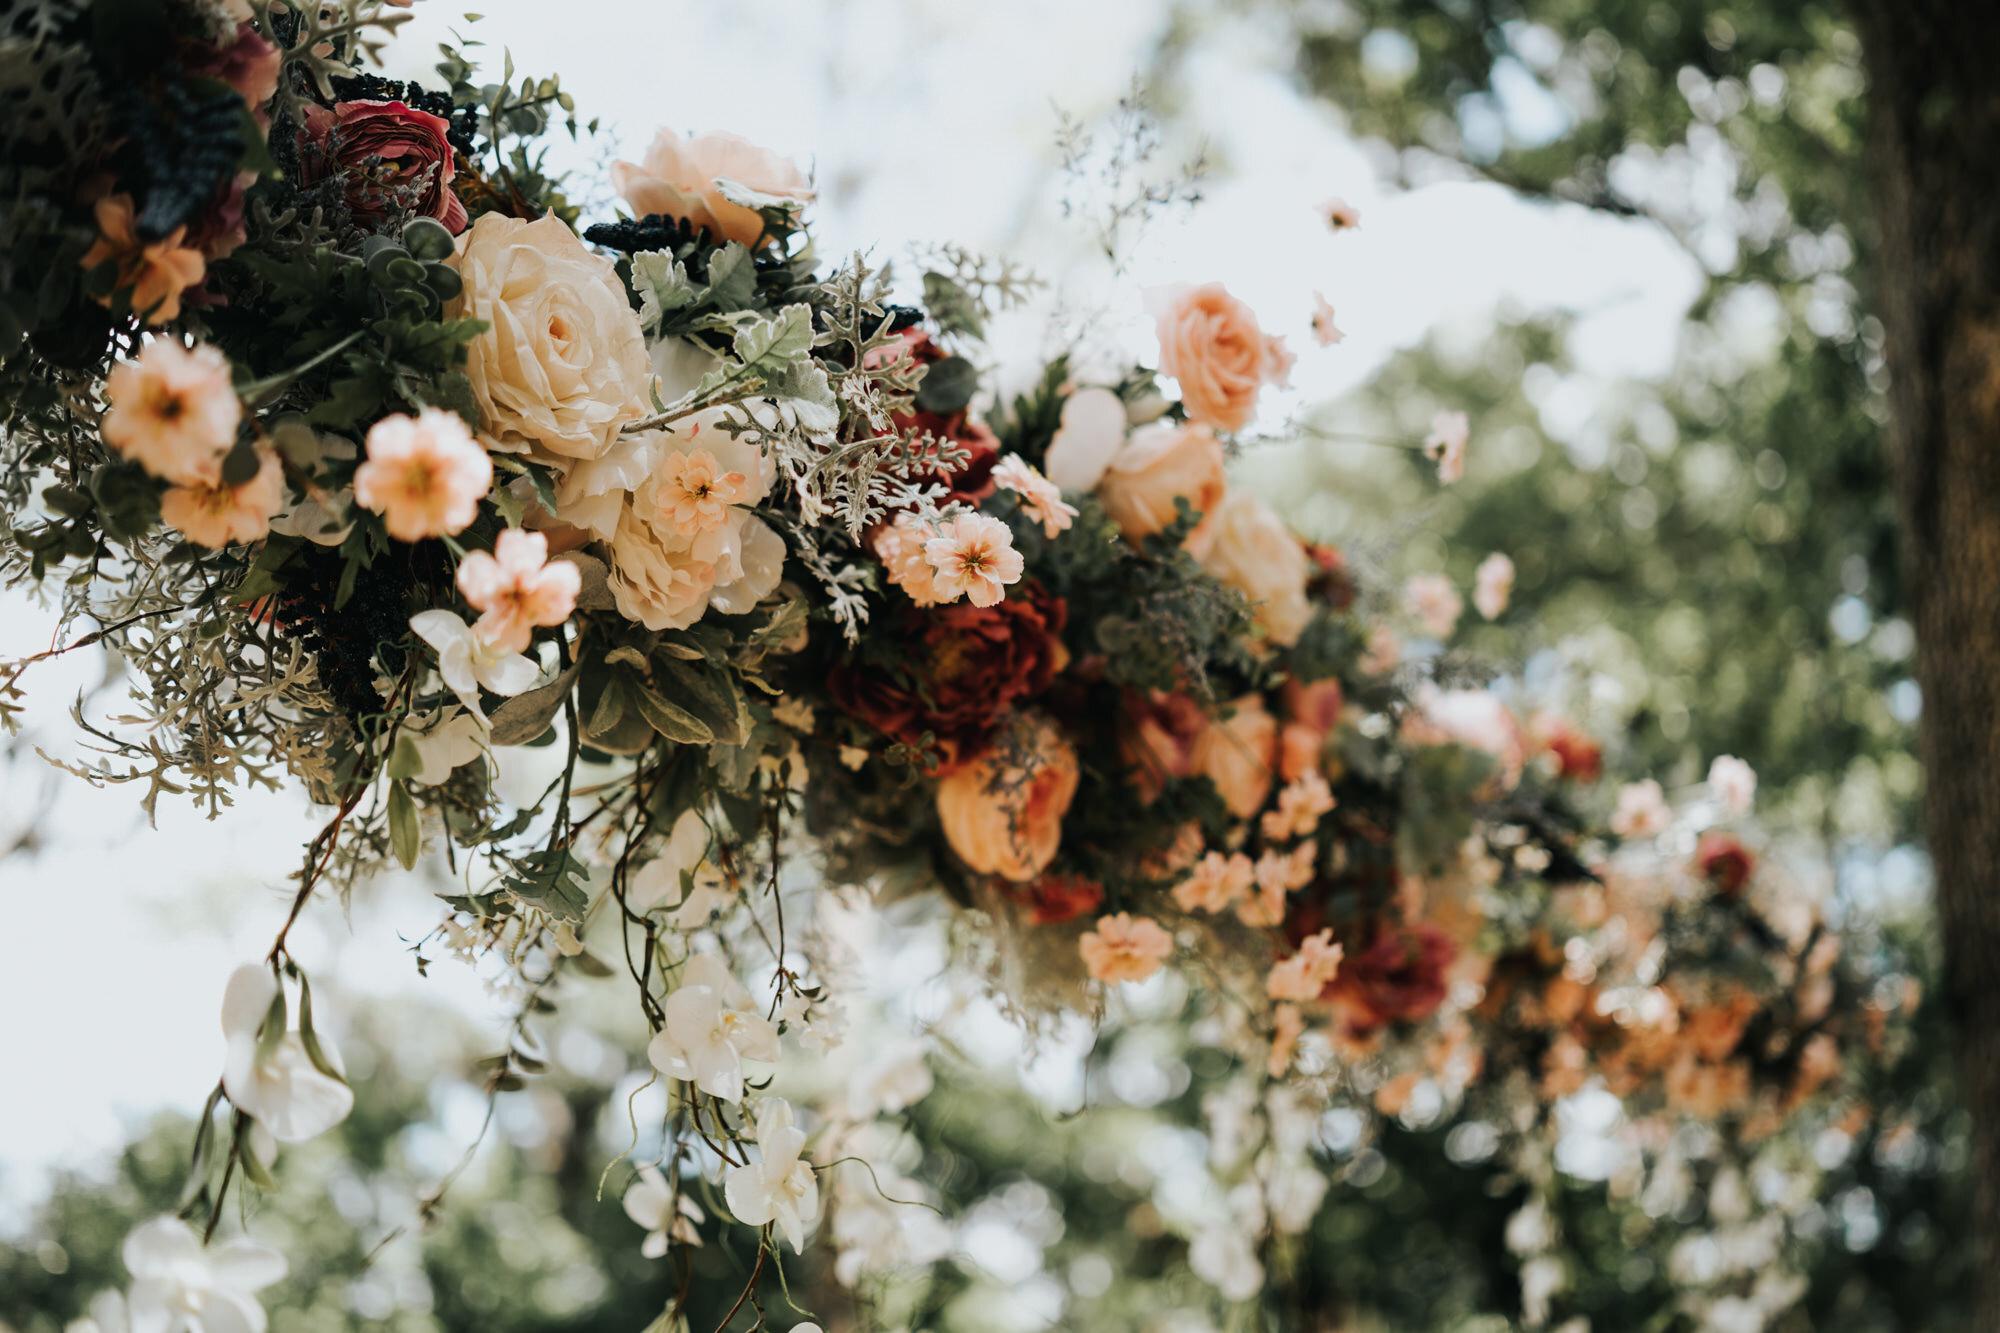 009Sean_Emily_Wedding_3-30-19.jpg